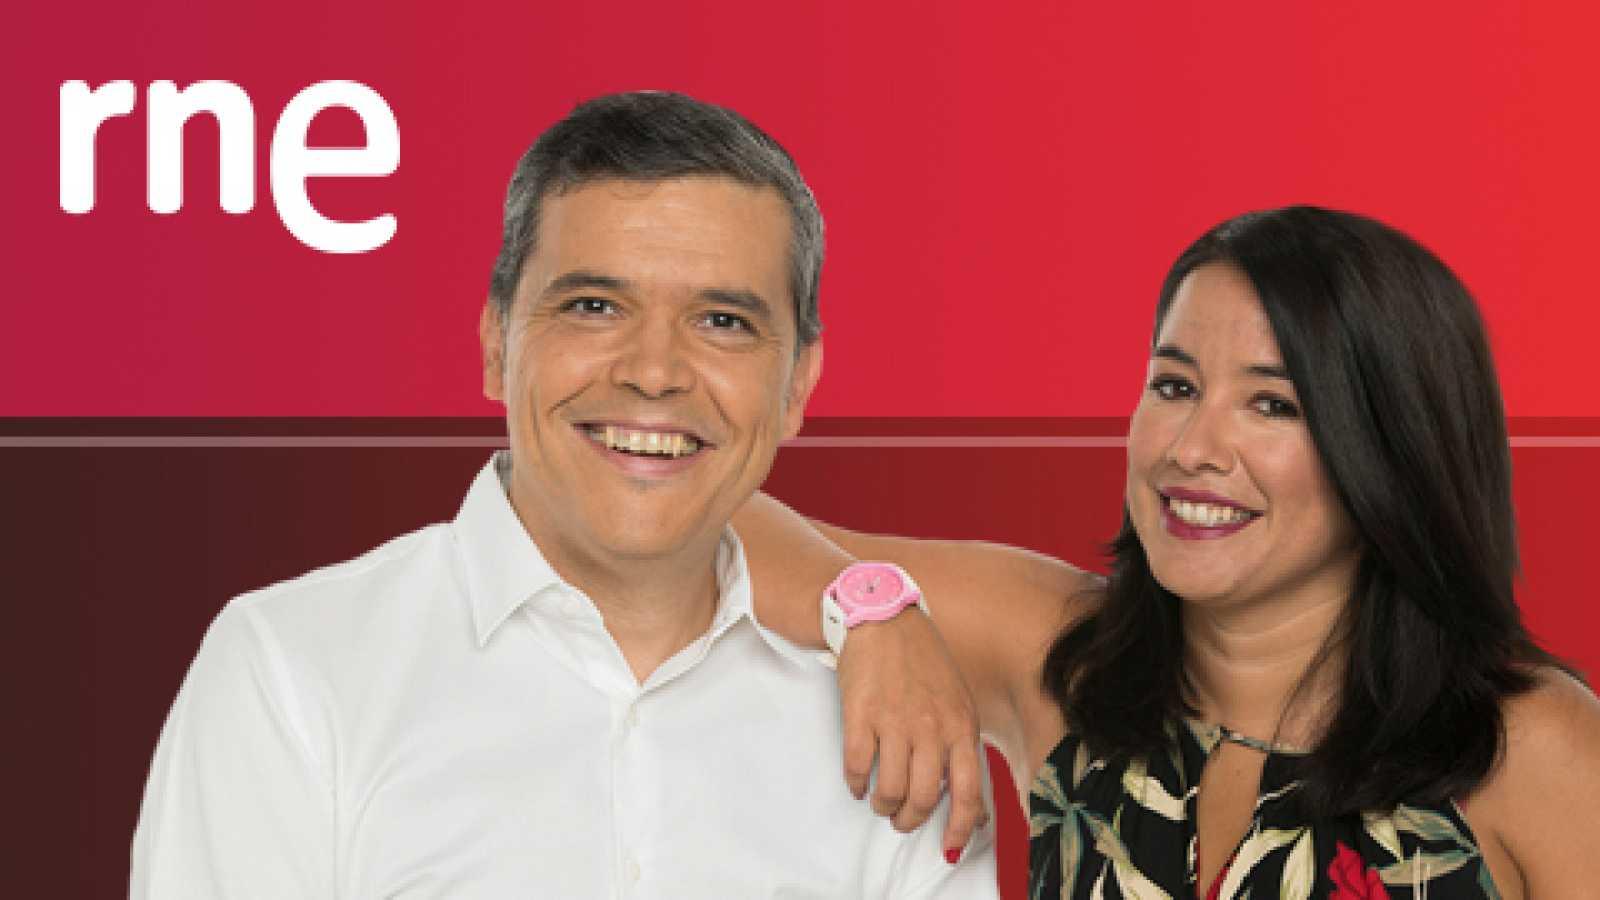 Las mañanas de RNE con Alfredo Menéndez - Segunda hora - 30/08/19 - escuchar ahora